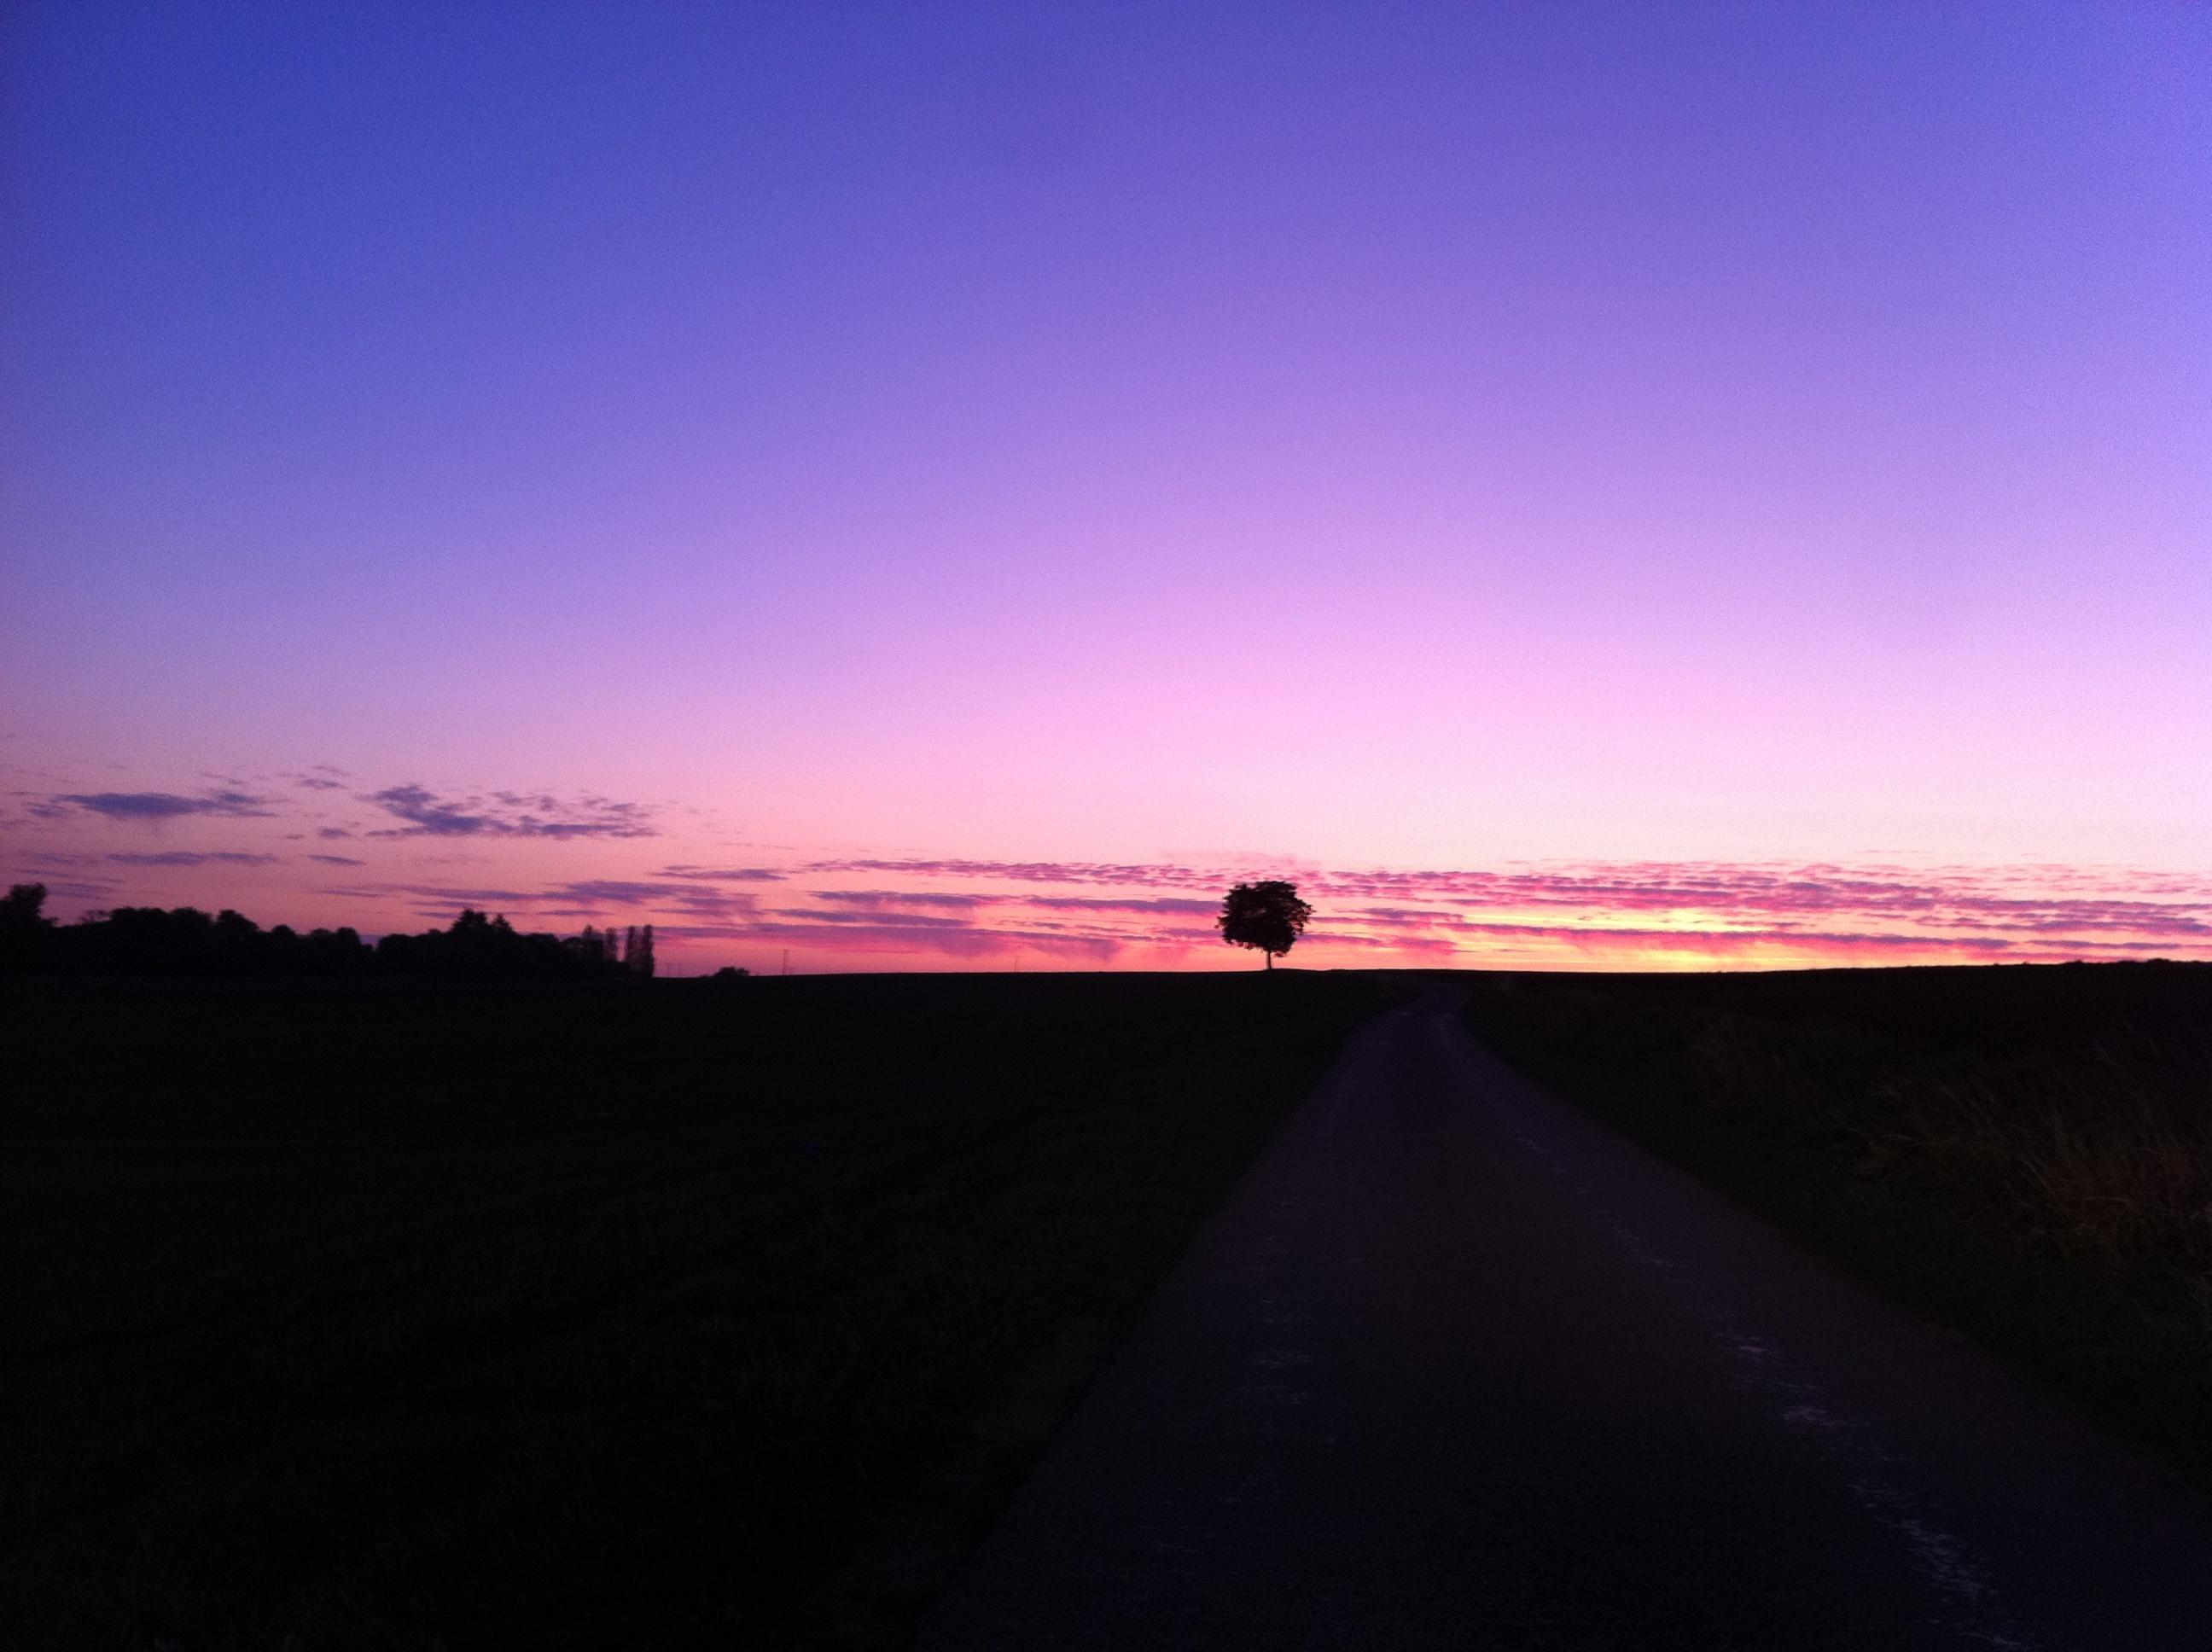 curiosity sunrise sunset times - HD2592×1936